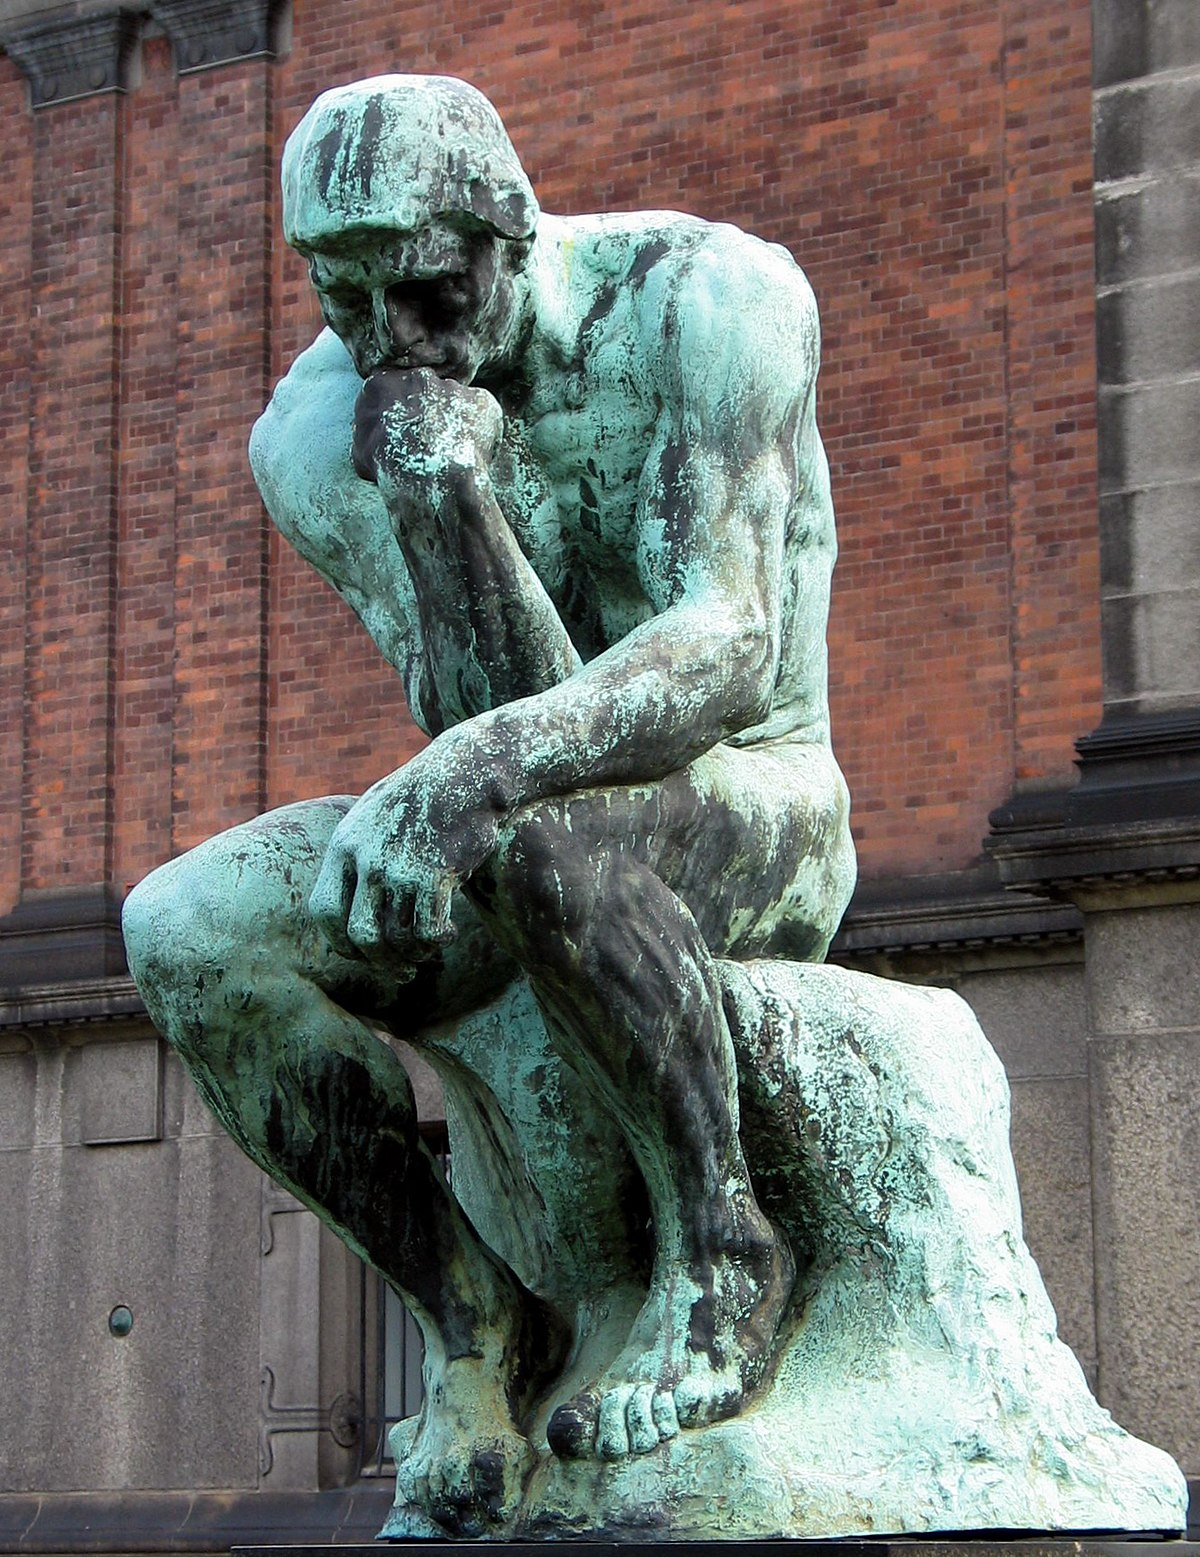 1200px-Auguste_Rodin_-_Grubleren_2005-02